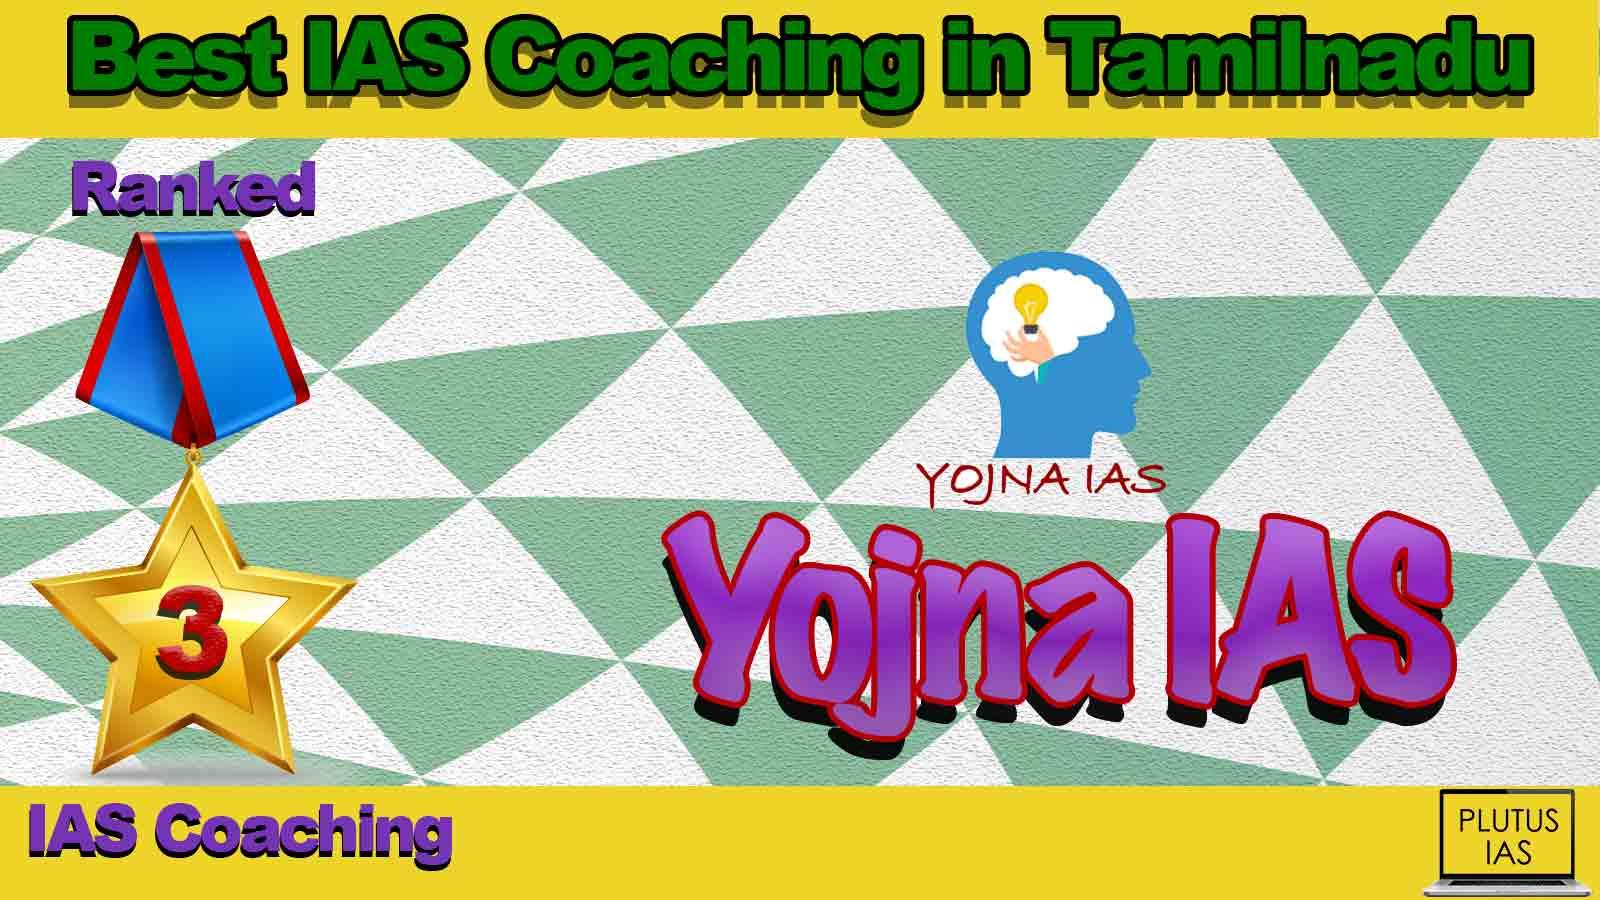 Best IAS Coaching in Tamilnadu